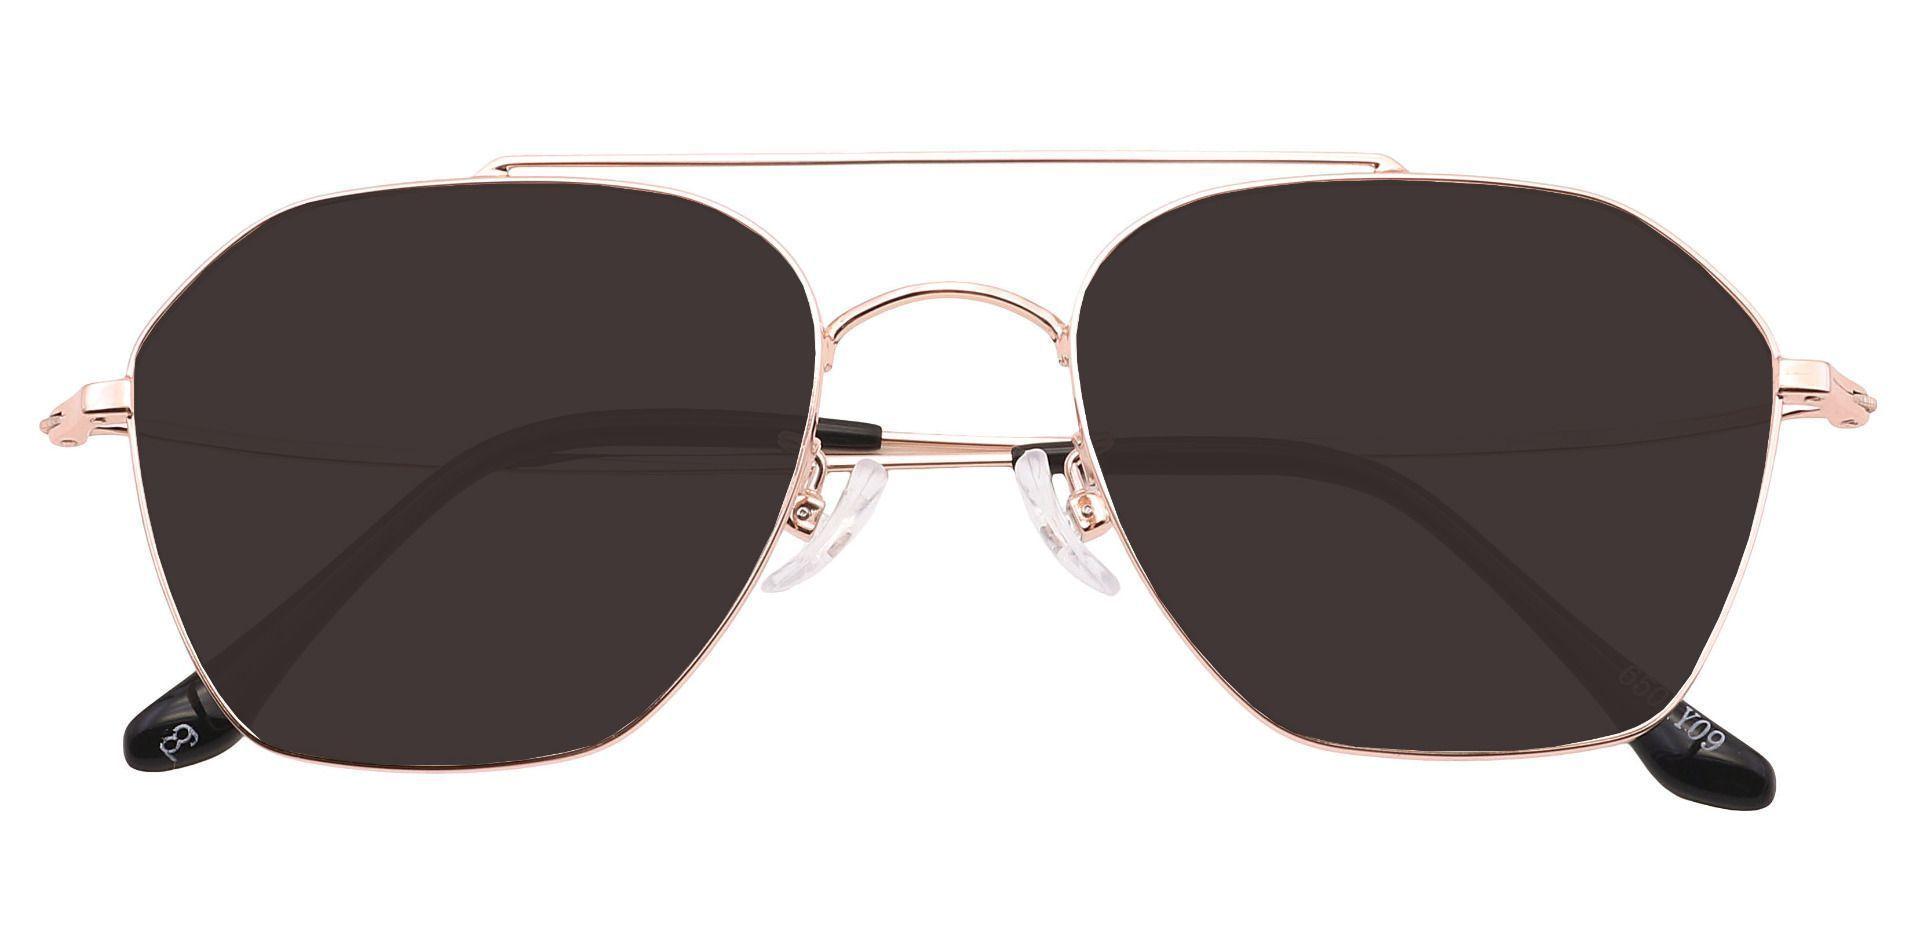 Judah Aviator Single Vision Sunglasses - Yellow Frame With Gray Lenses